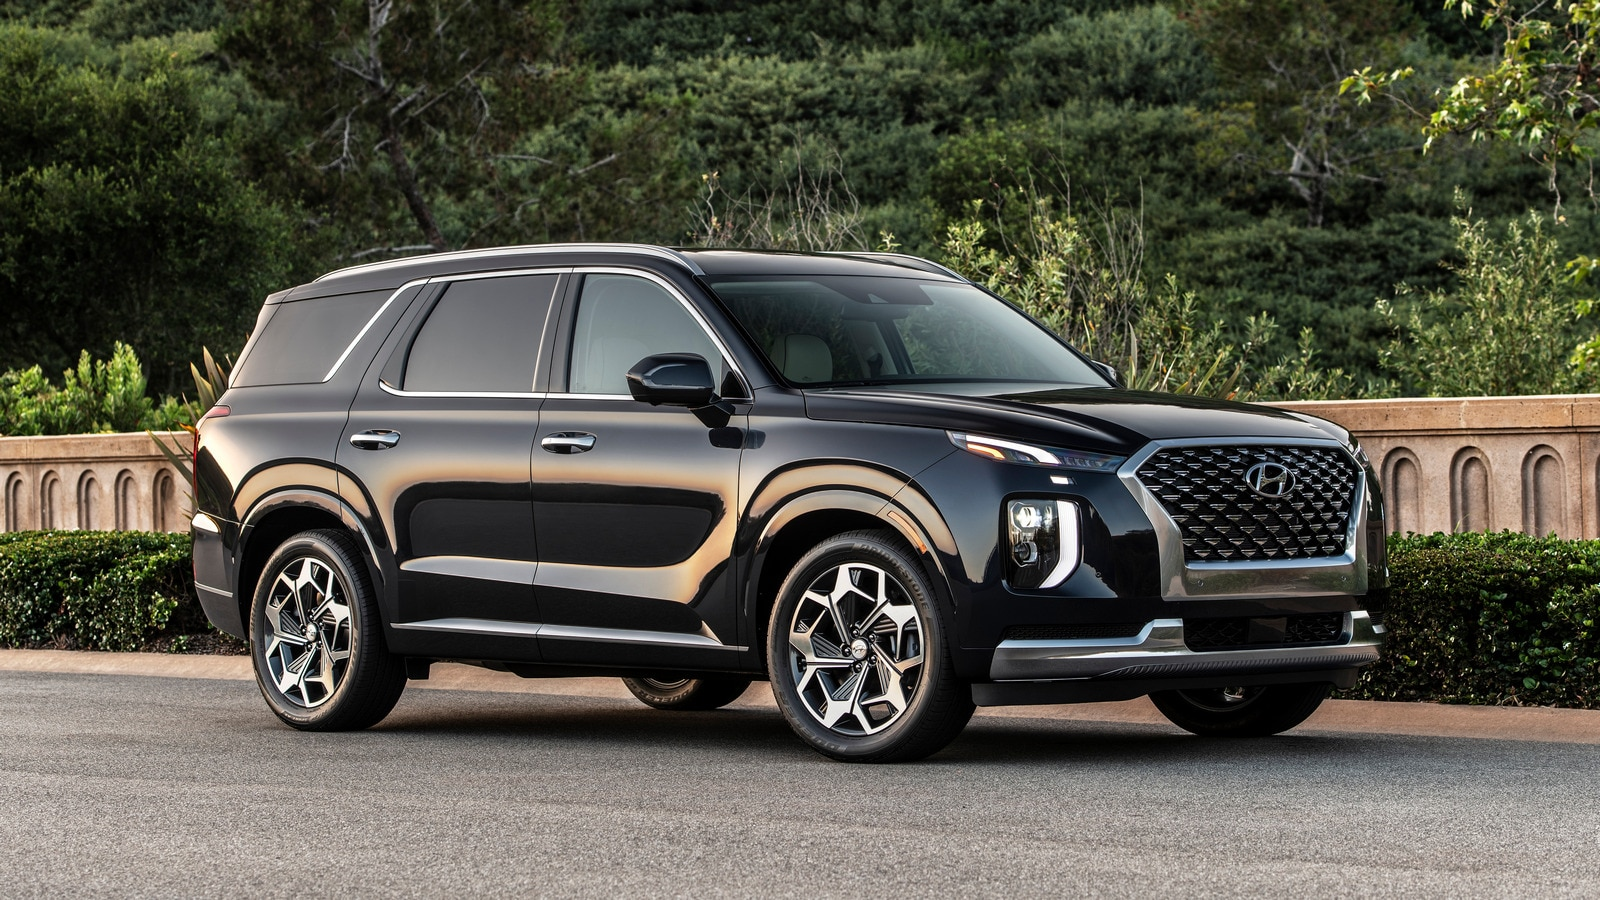 23 Best Midsize SUVs for 2021 | Kelley Blue Book